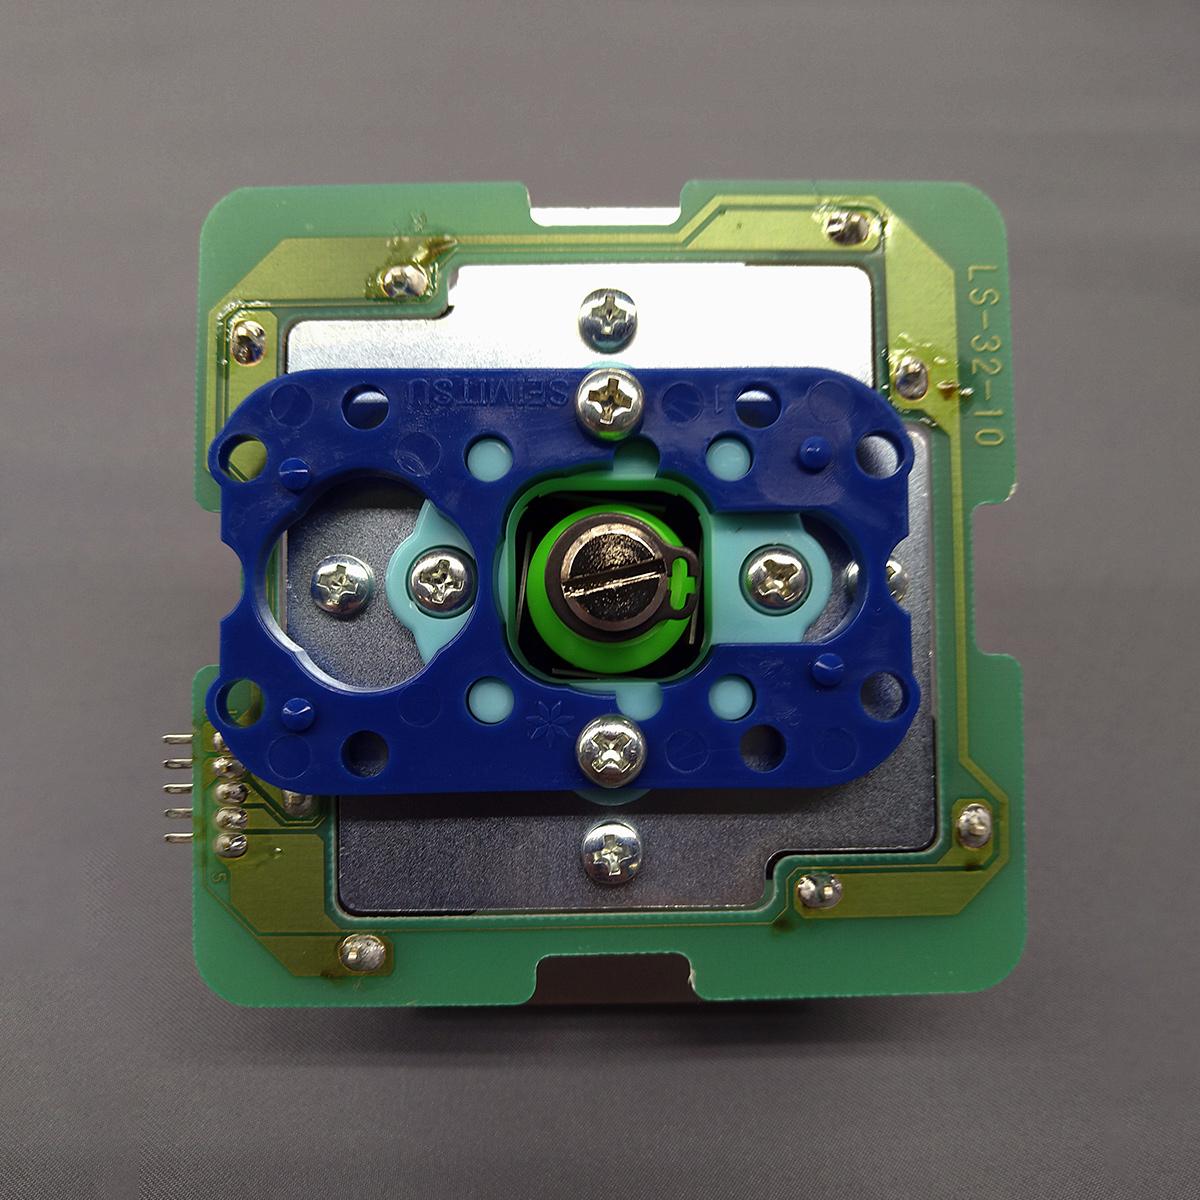 LS-32-01-MS 基盤タイプジョイスティックレバー(シャフトカバー無し)